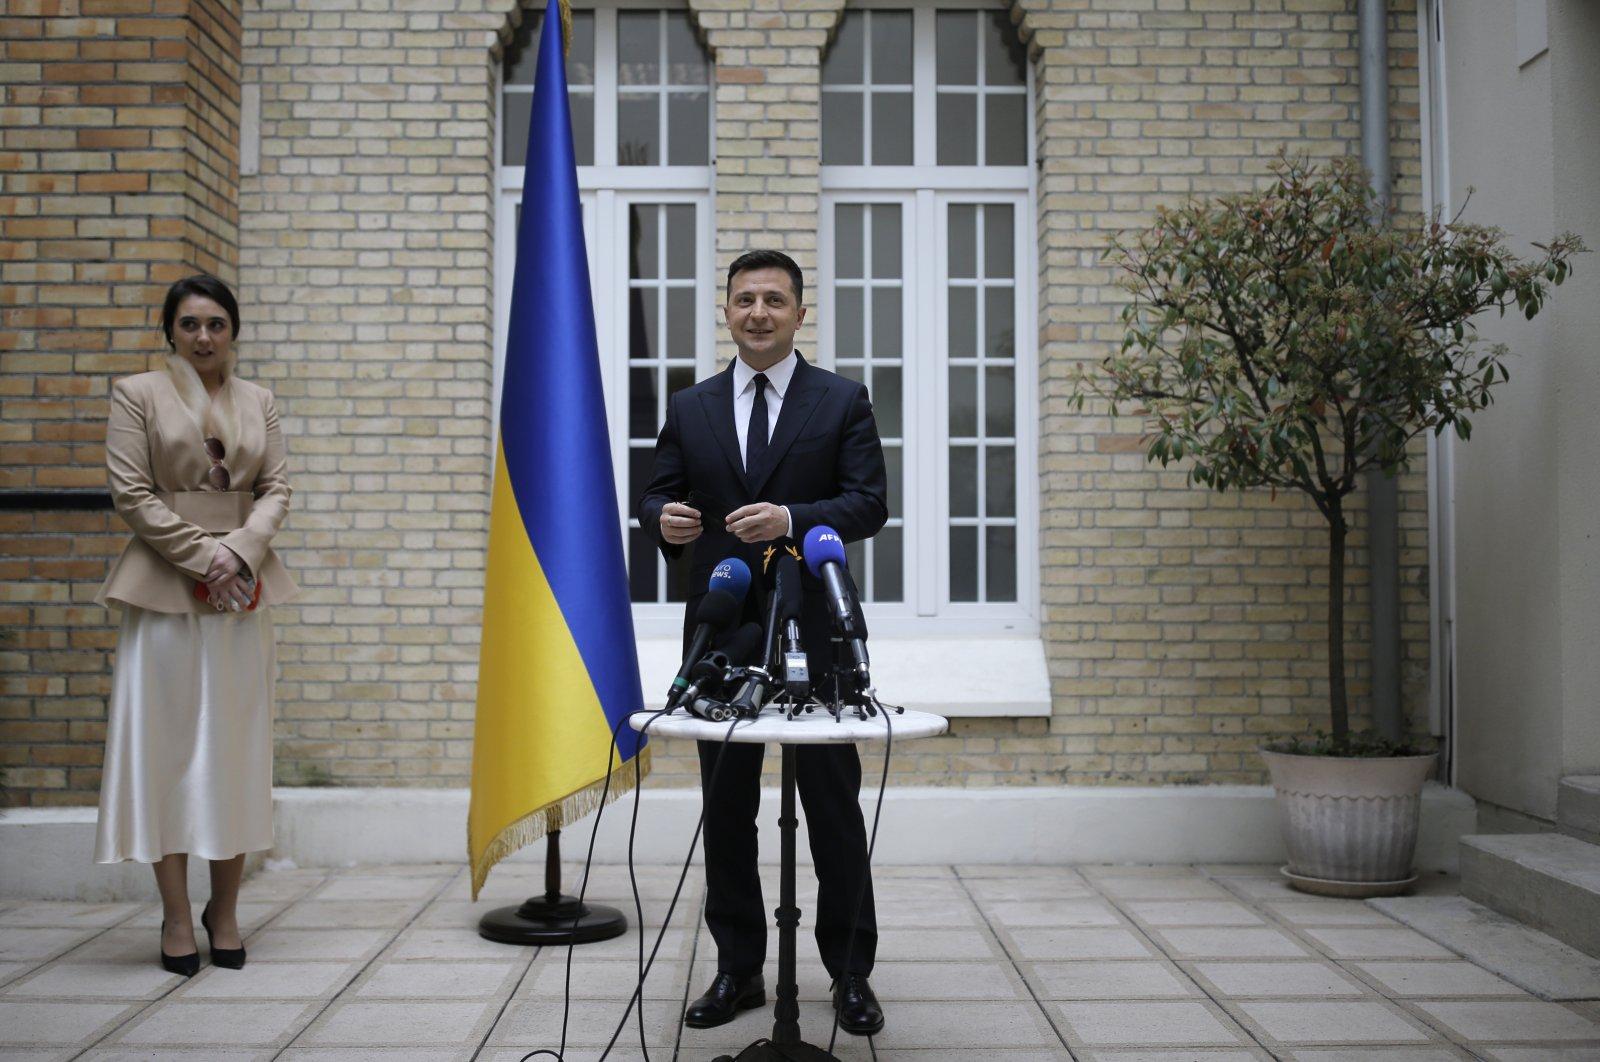 Ukrainian President Volodymyr Zelenskiy holds a press conference at the Ukrainian Embassy in Paris, France, April 16, 2021. (AP Photo)